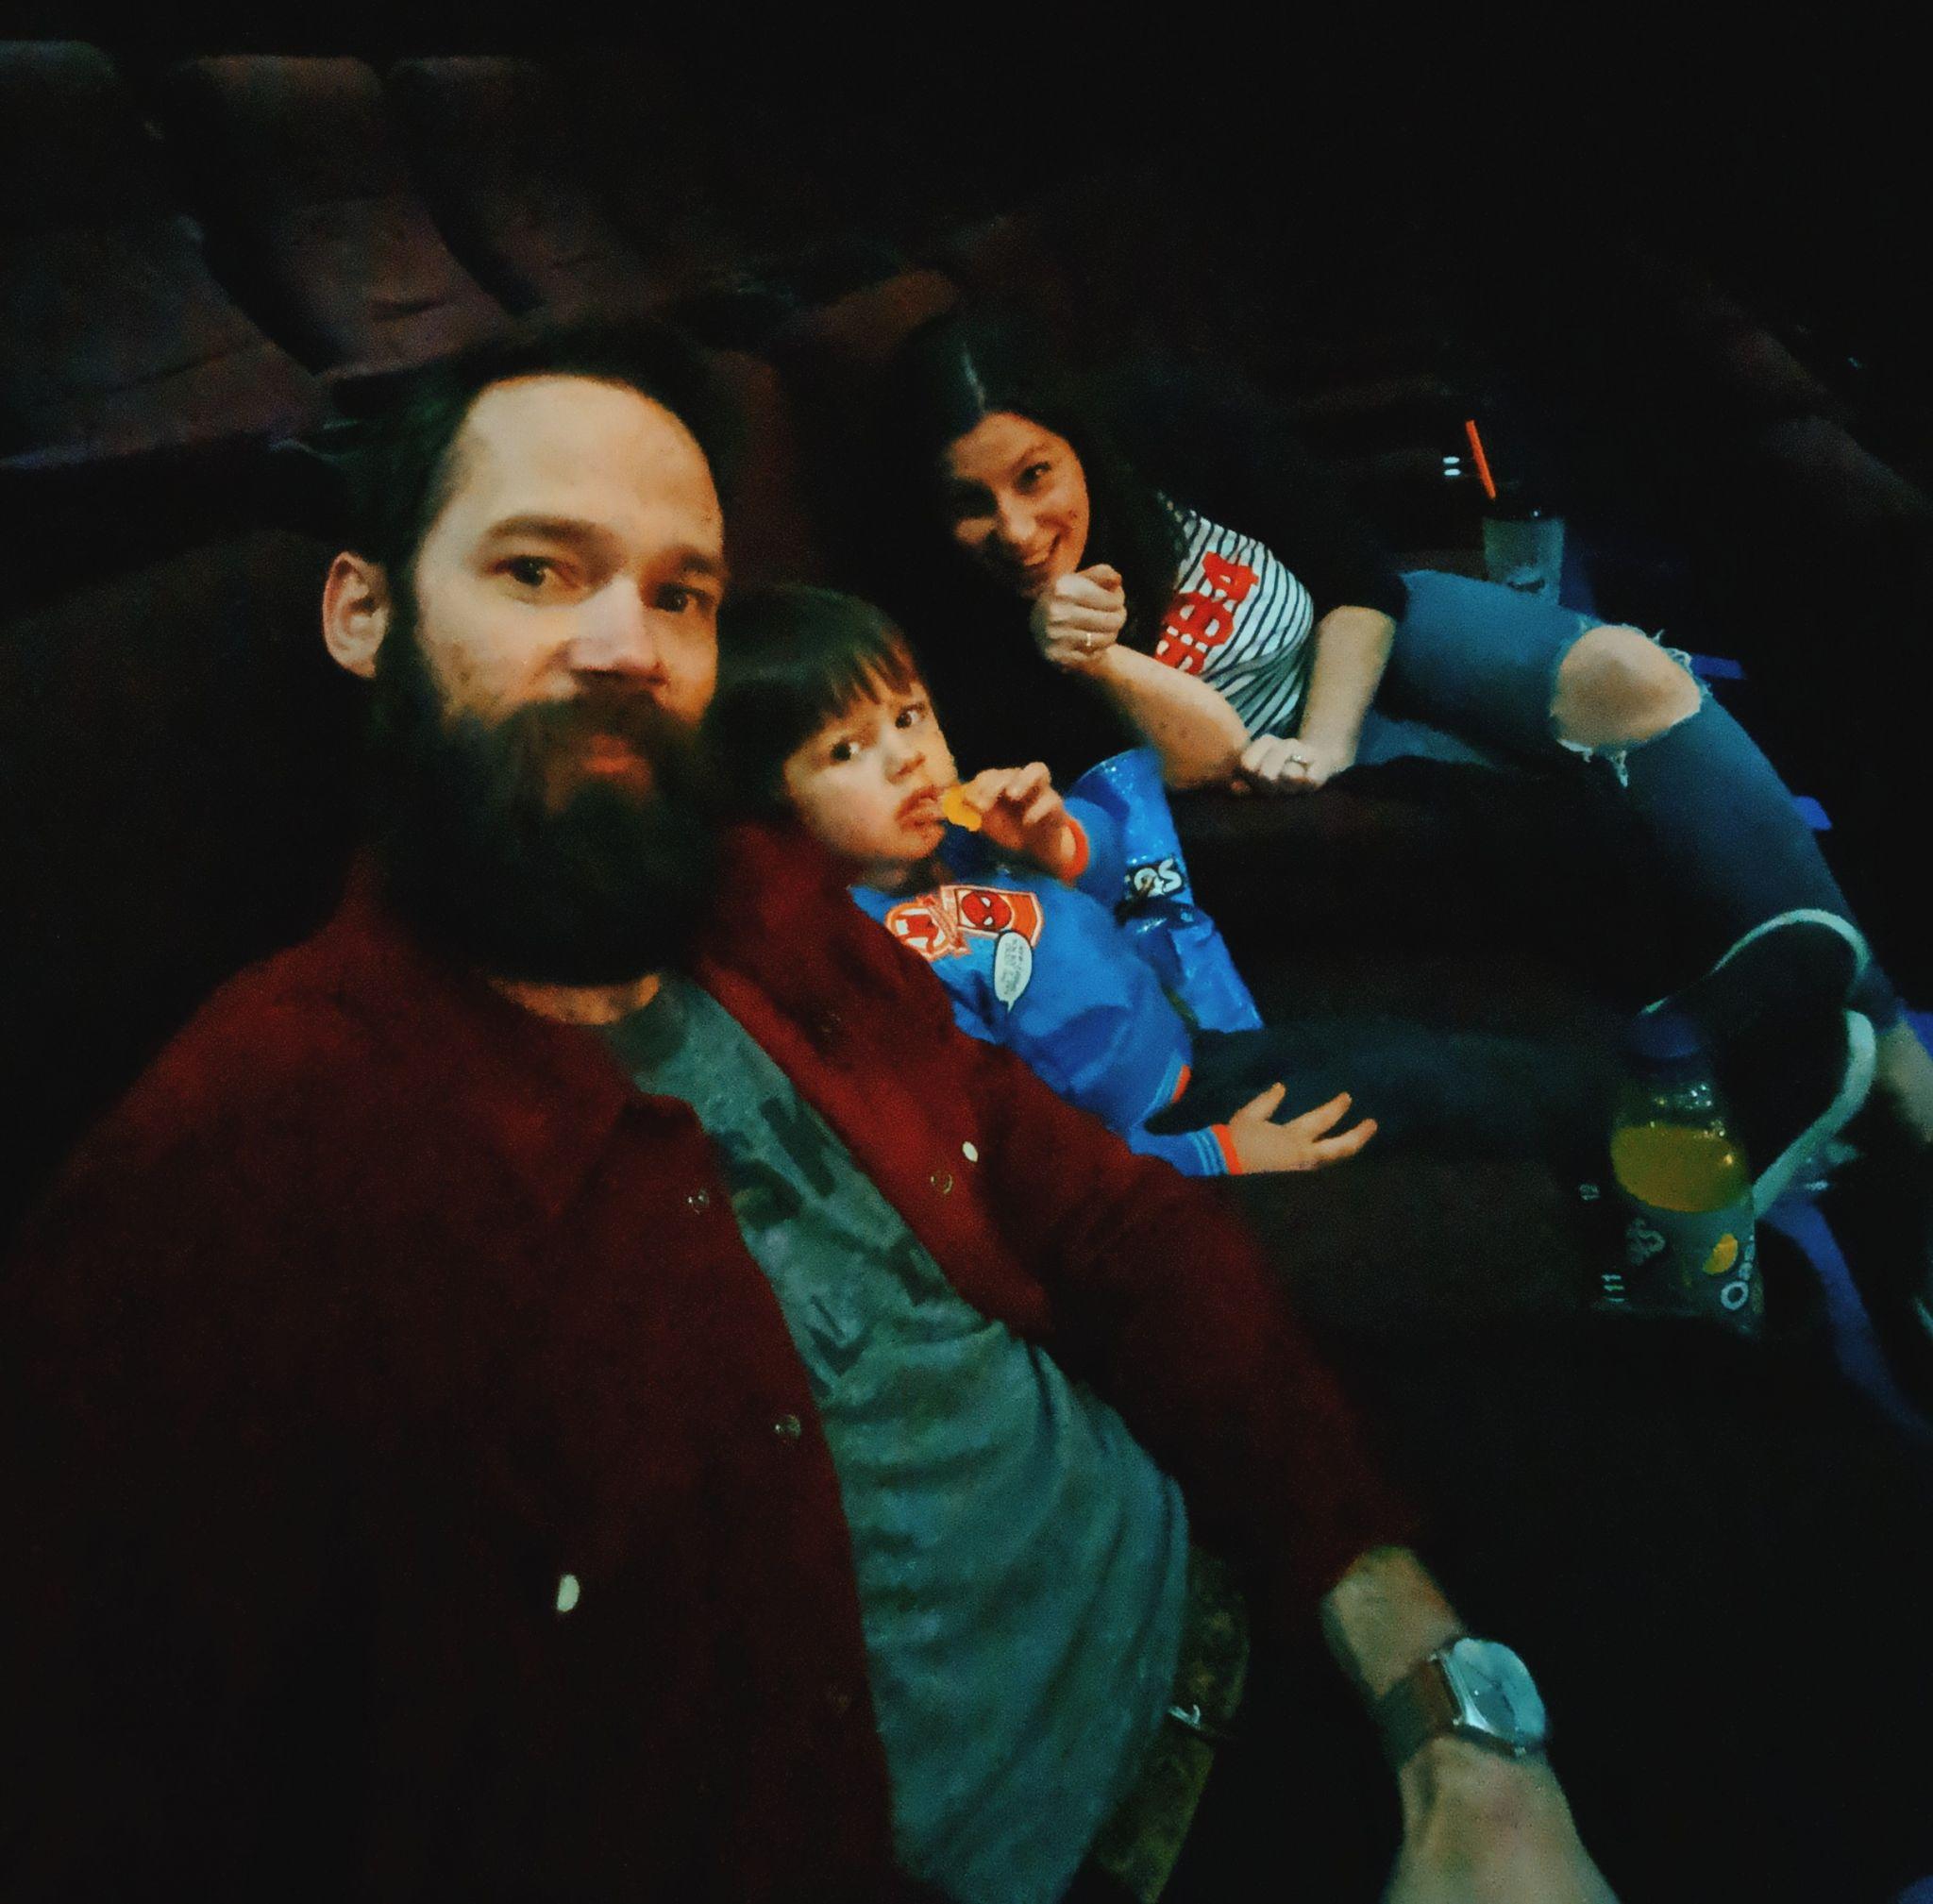 Vue Cinema Altrincham